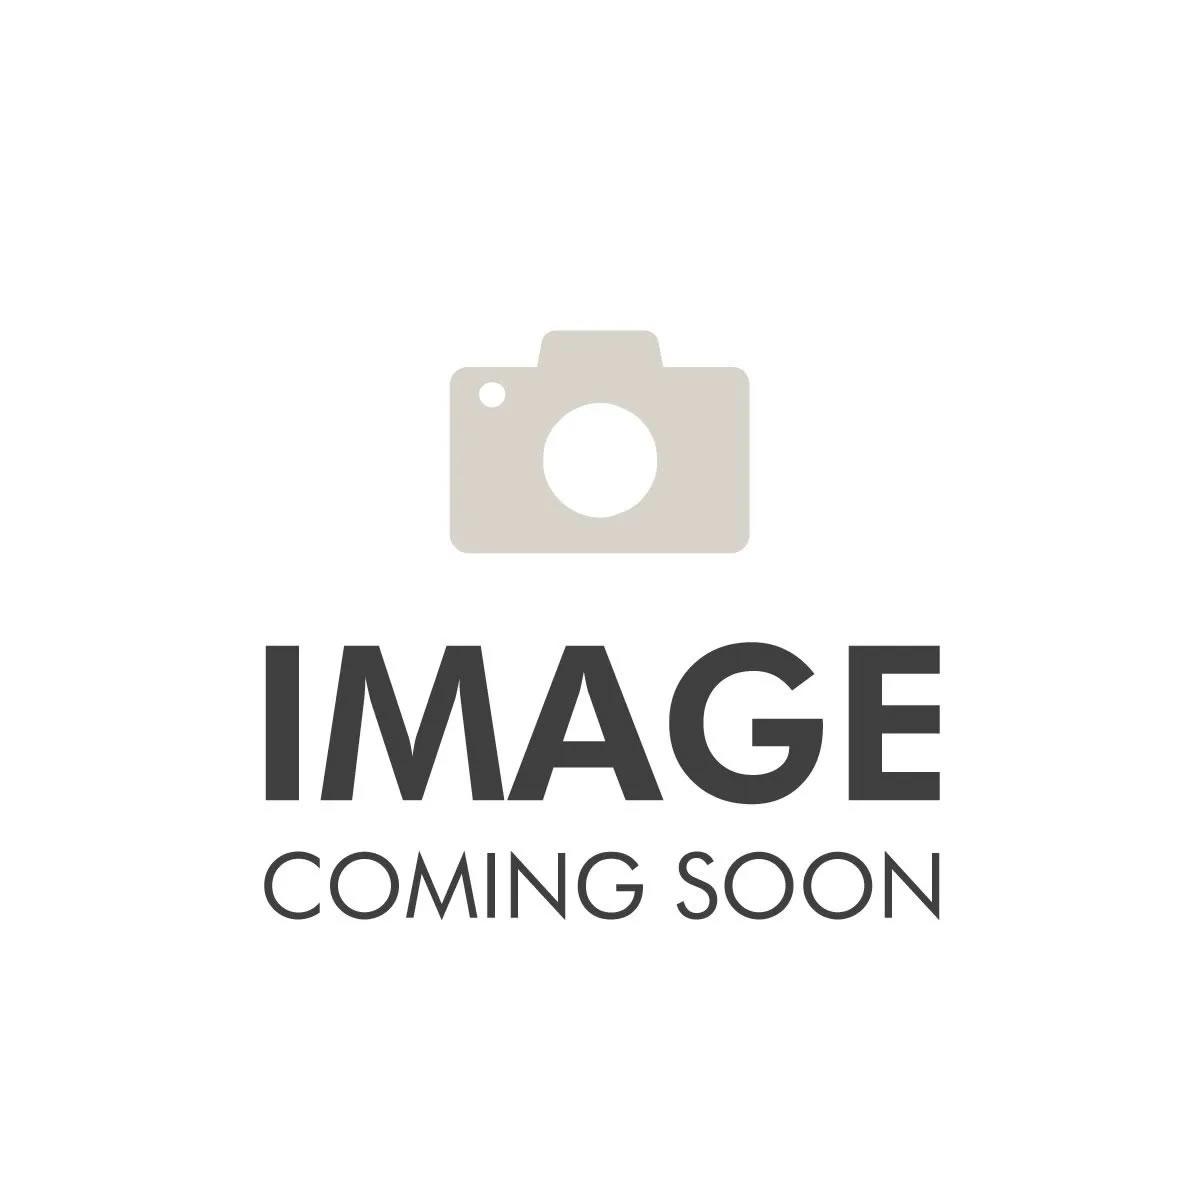 Windshield Hinges, Stainless Steel; 07-17 Jeep Wrangler JK